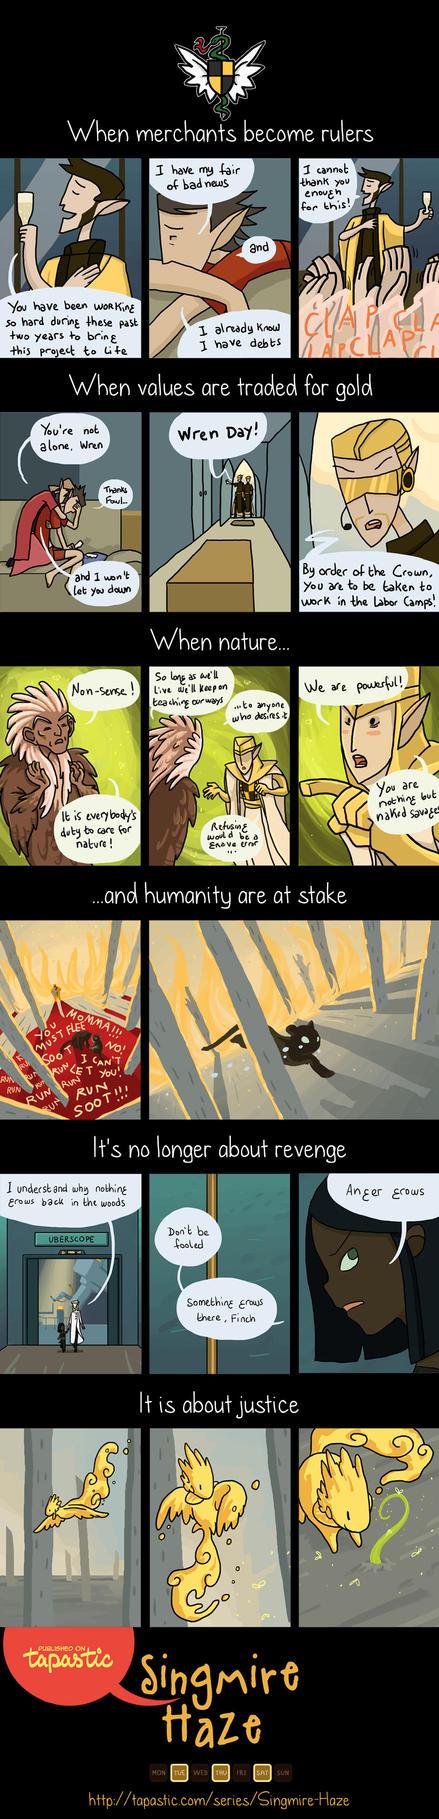 Singmire Haze - Comics Teaser by Izz-noxfox